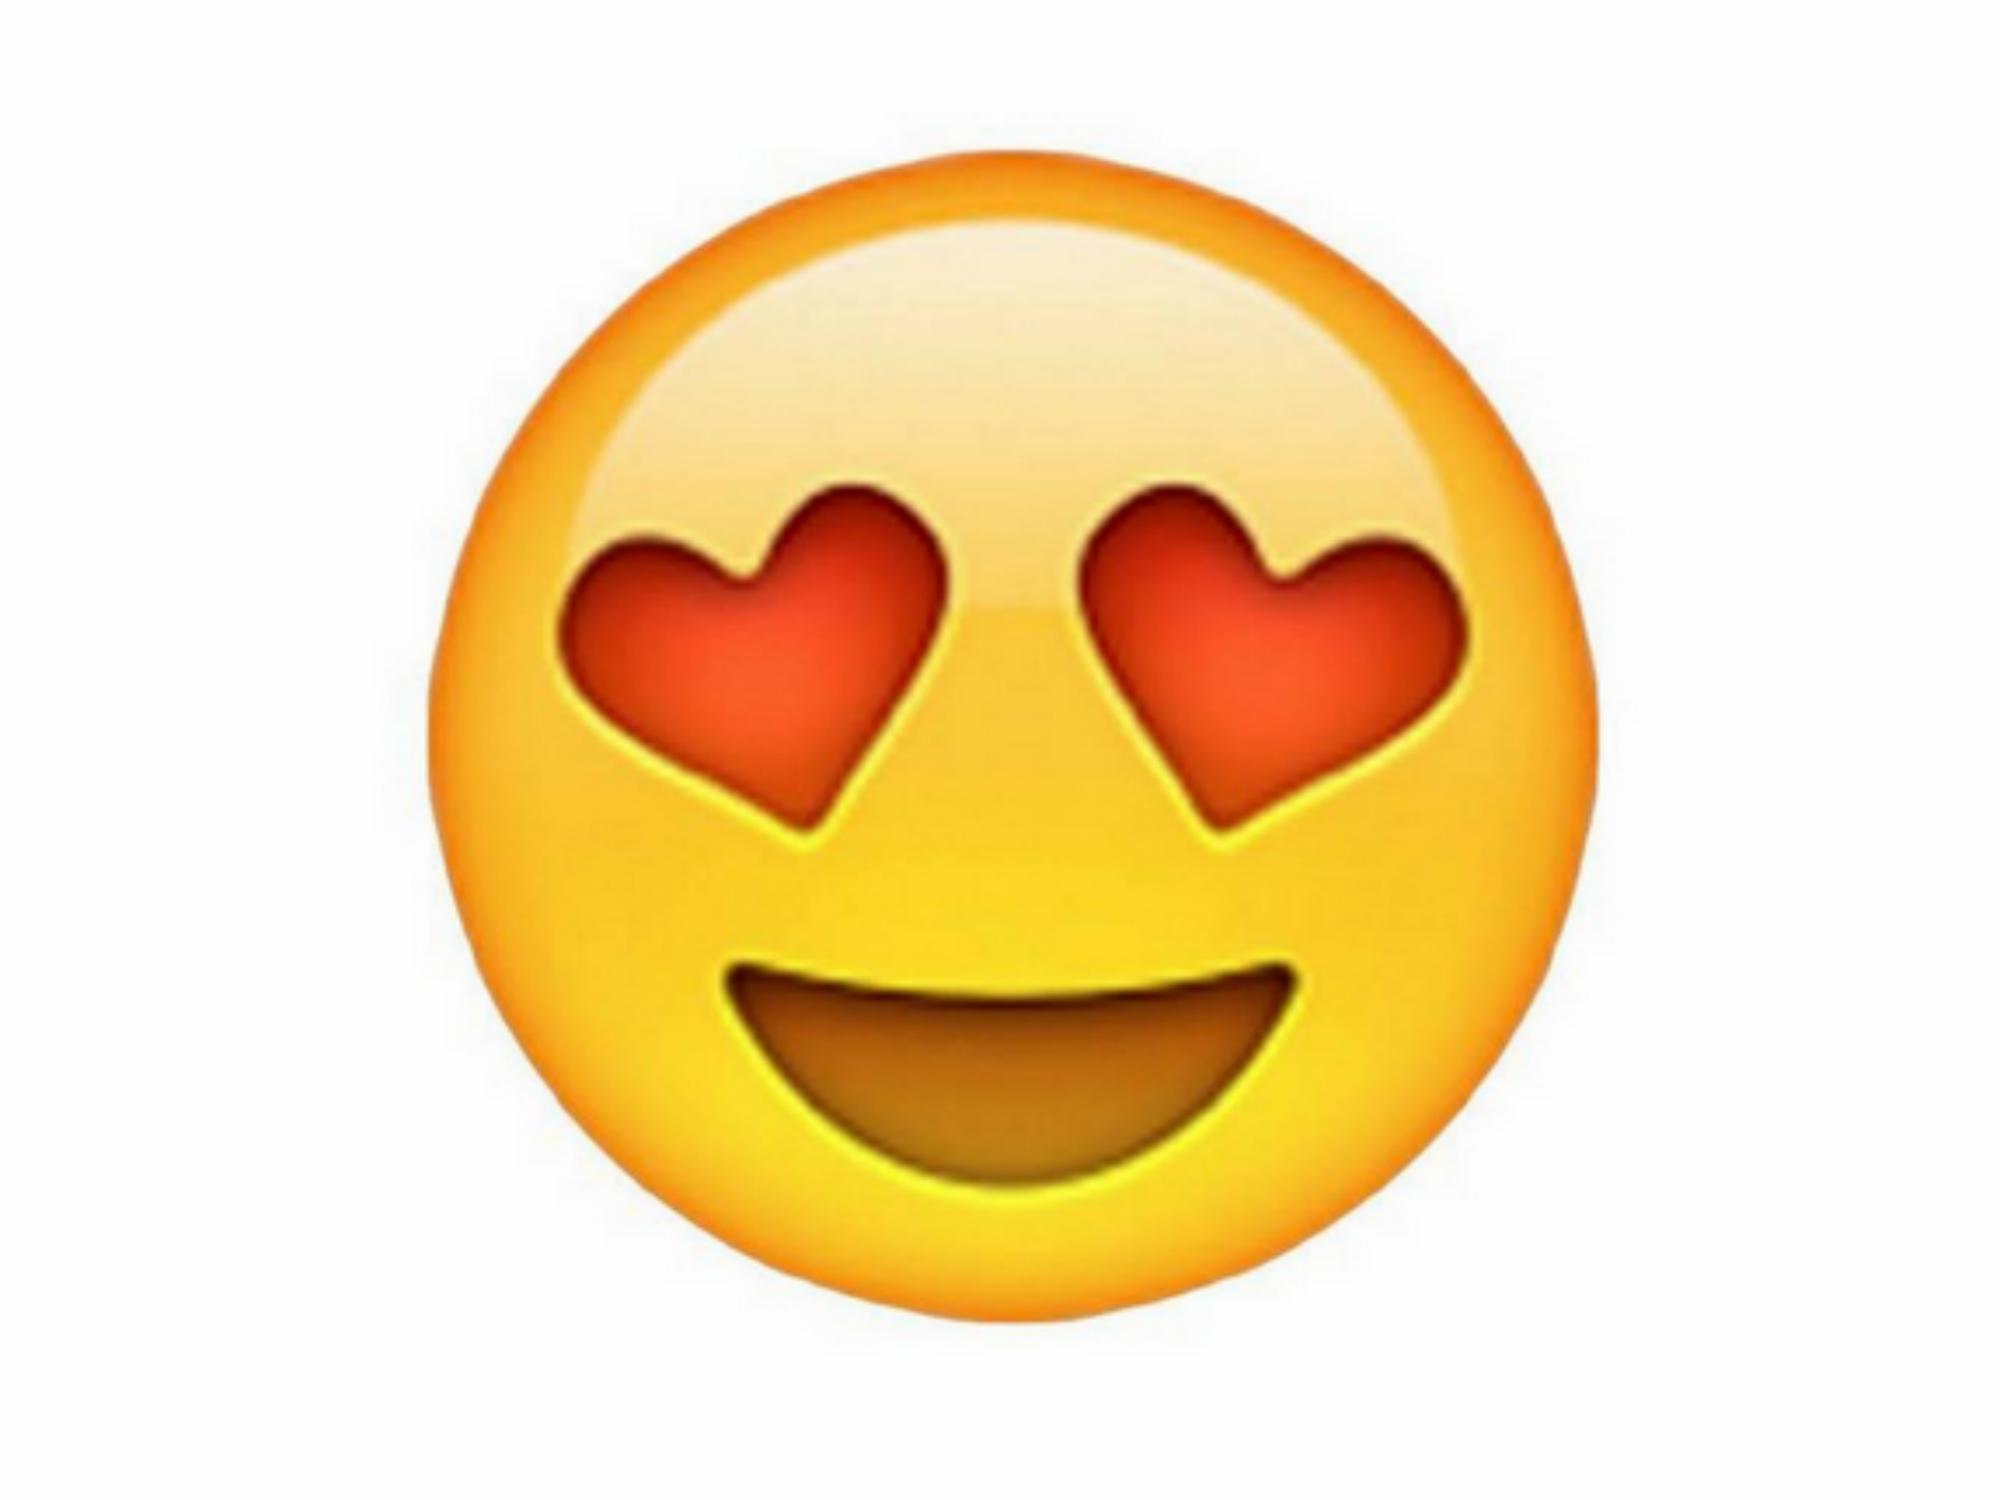 Mes 2 copines super excitees gouinent et baisent 5